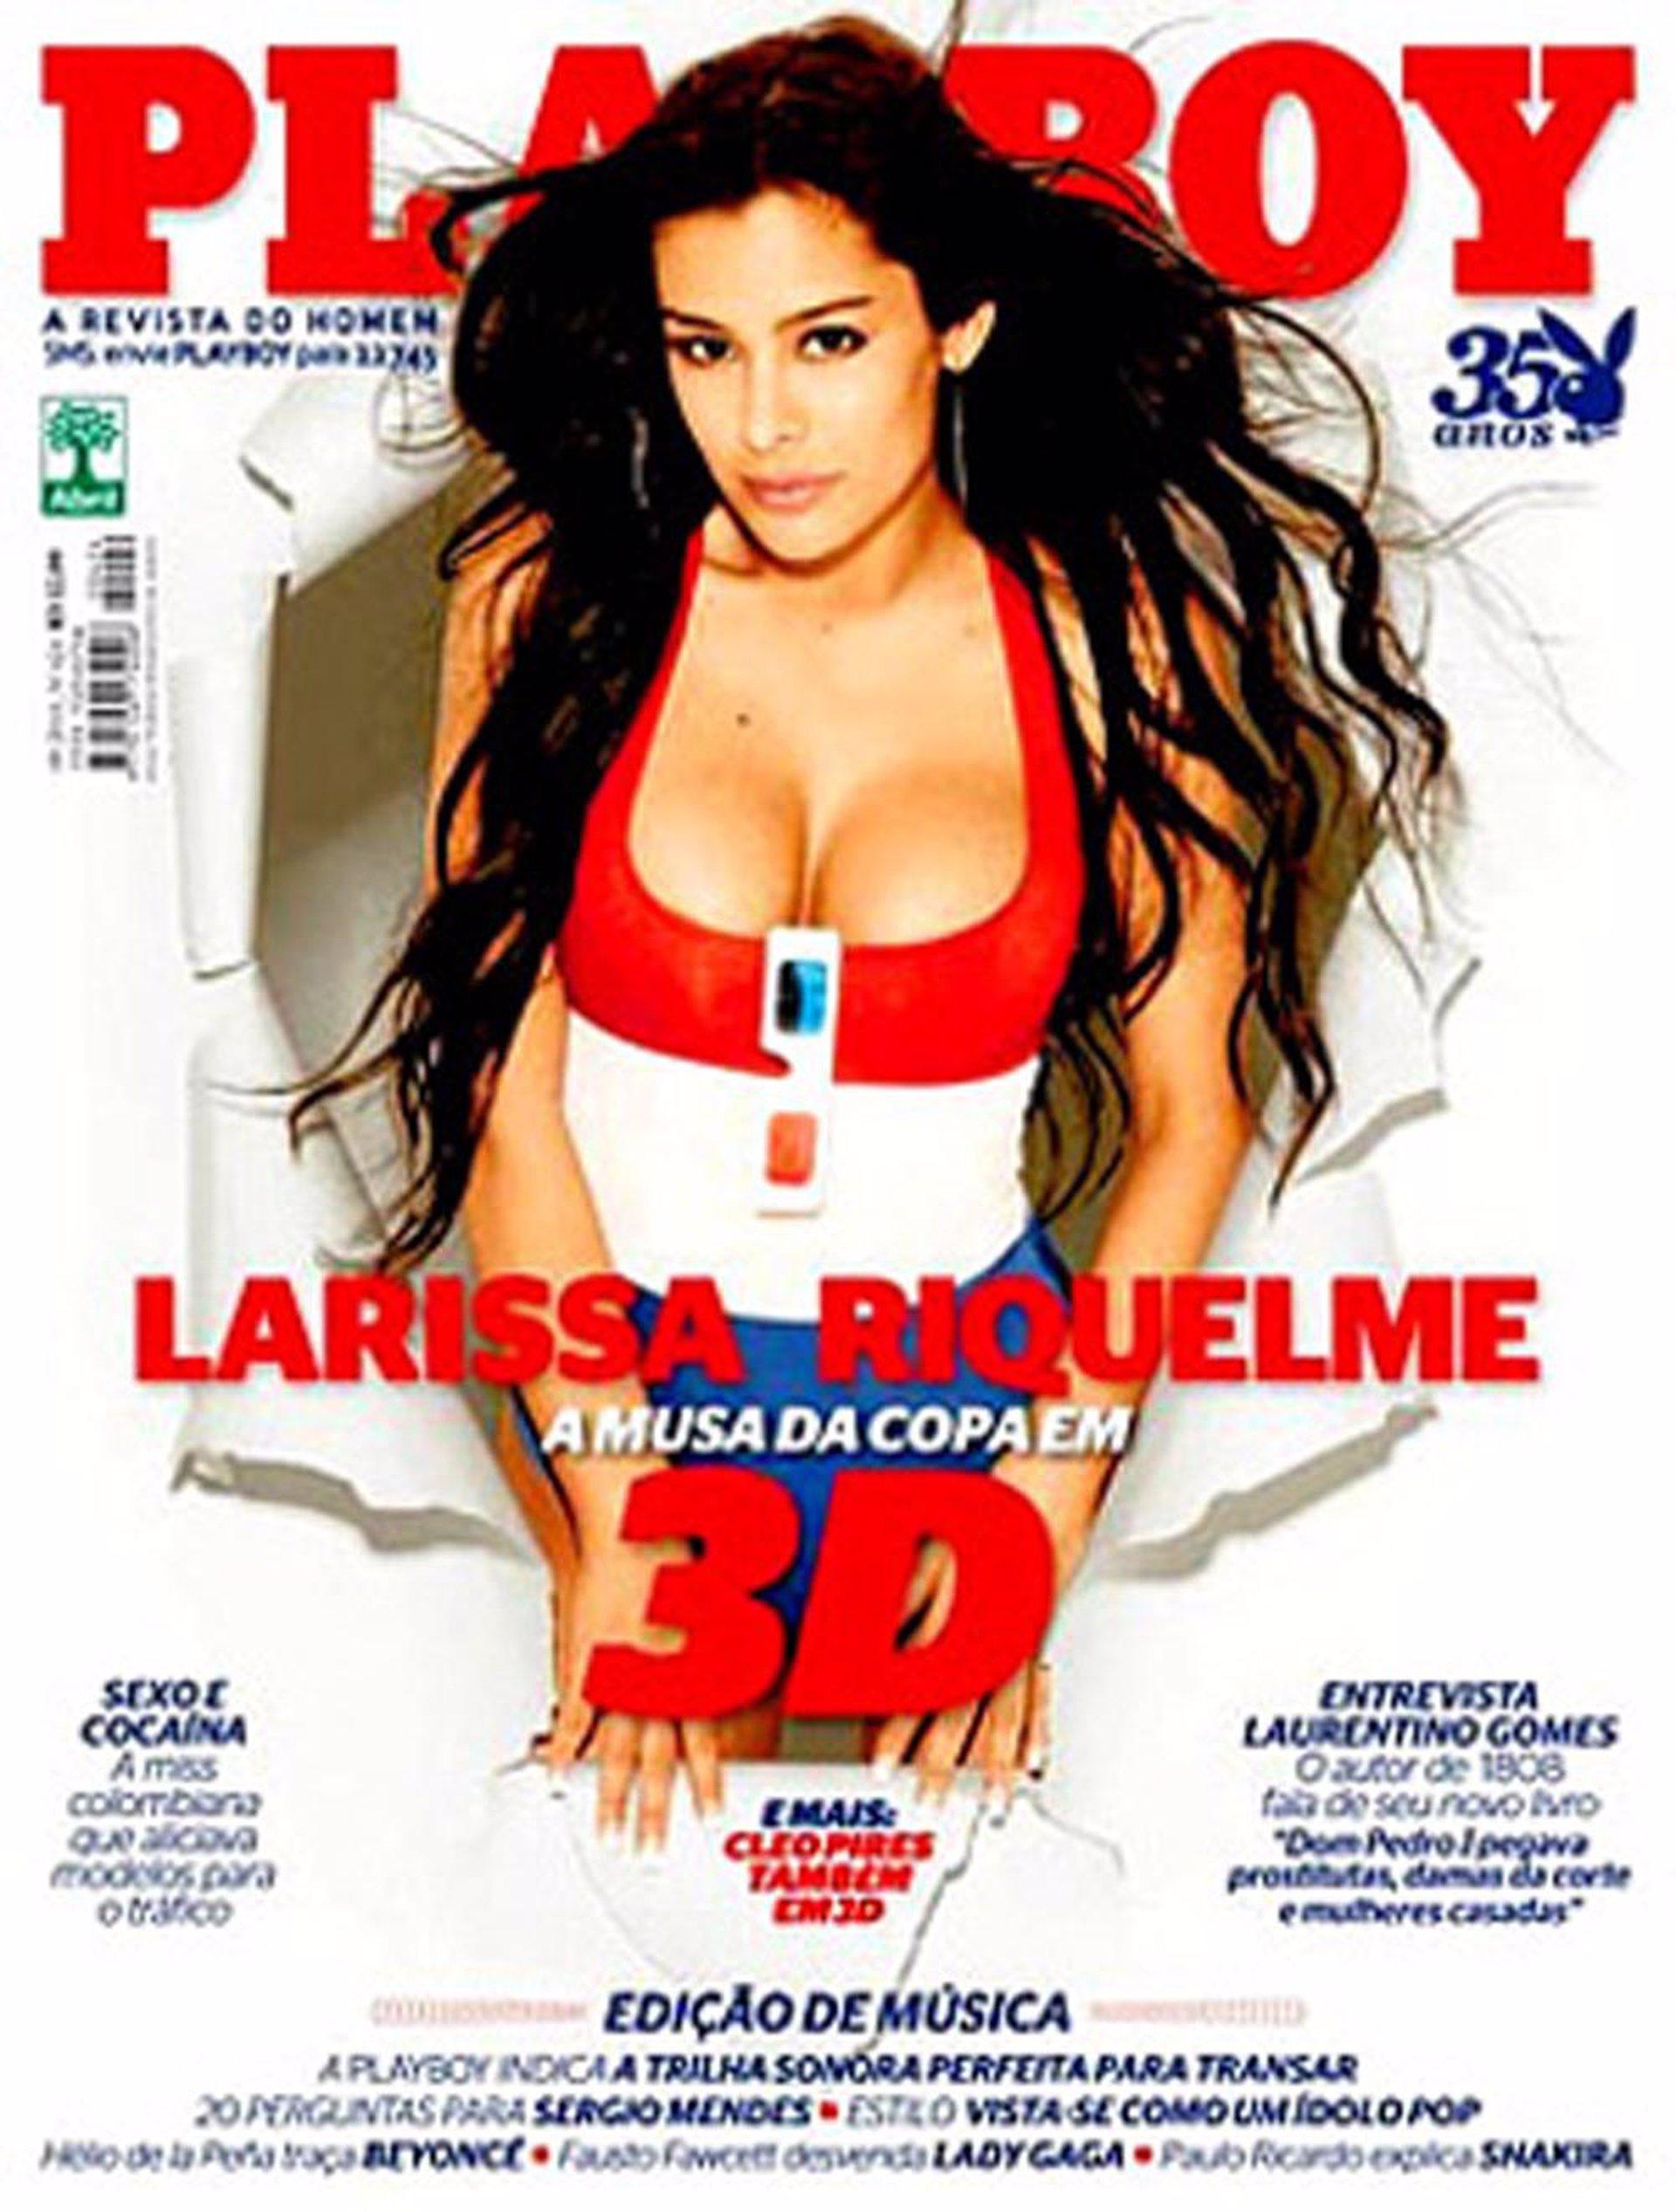 Larissa Riquelme desnuda en Paraguay si sale campeon - YouTube